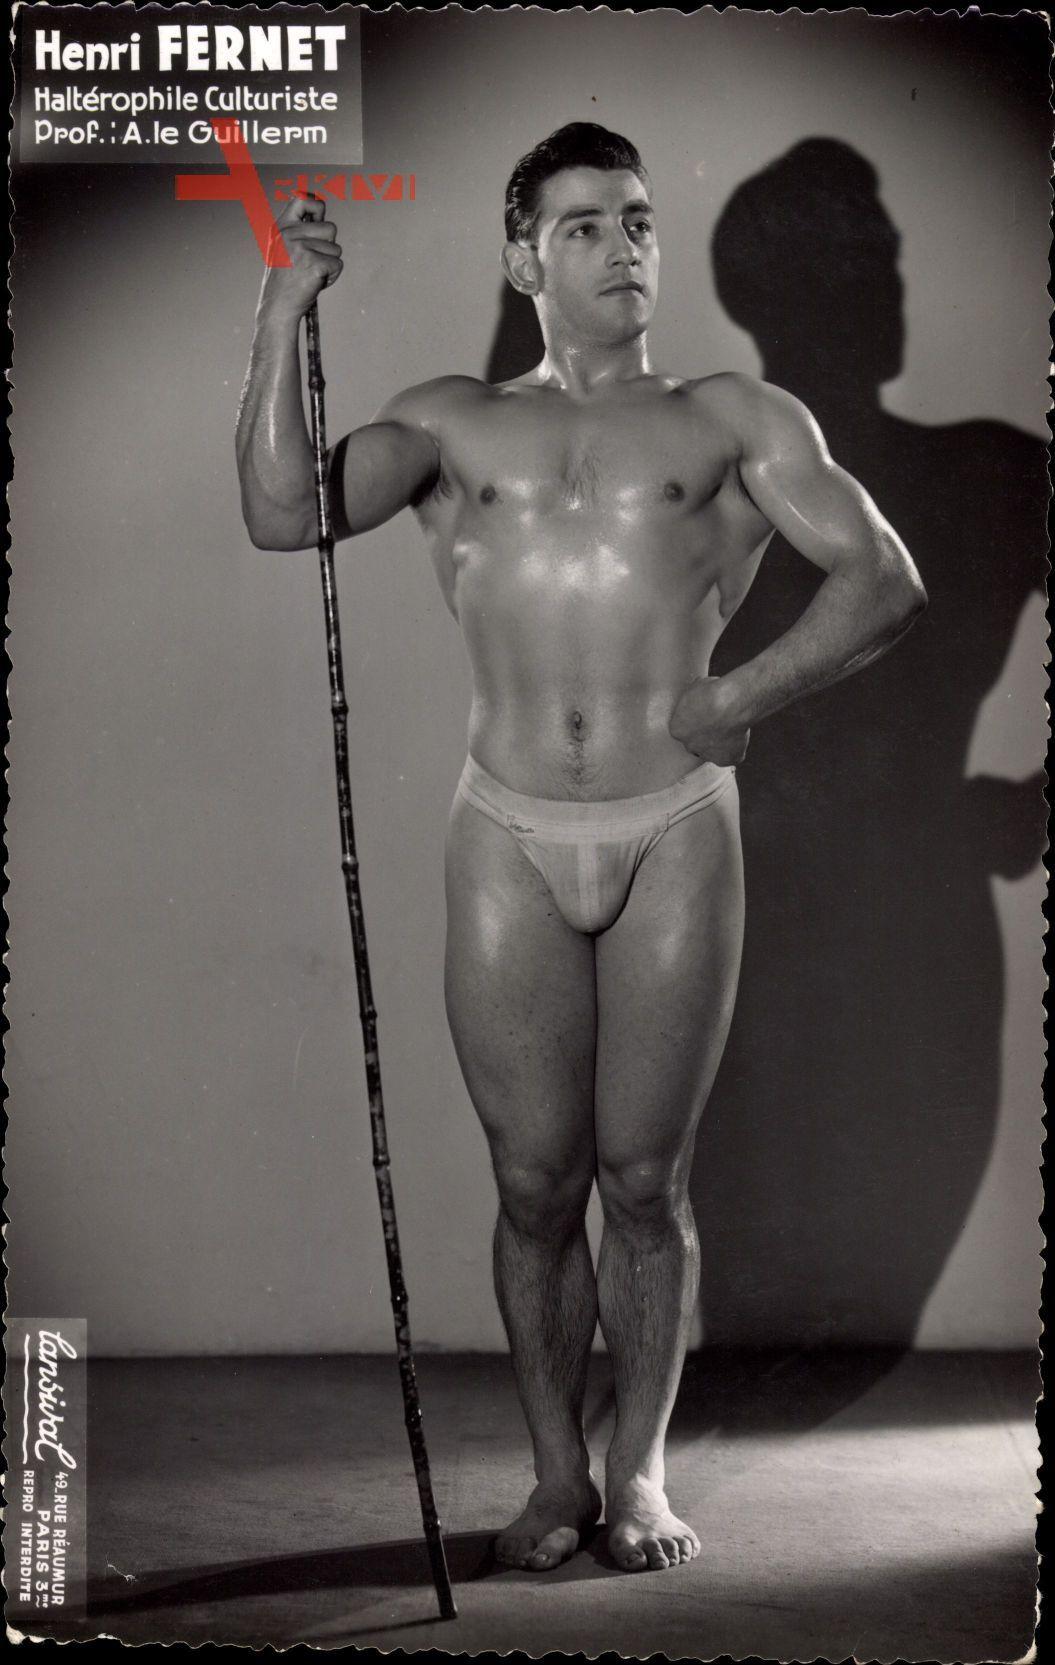 Henri Fernet, Haltérophile Culturiste, Bodybuilder, Gewichtheber